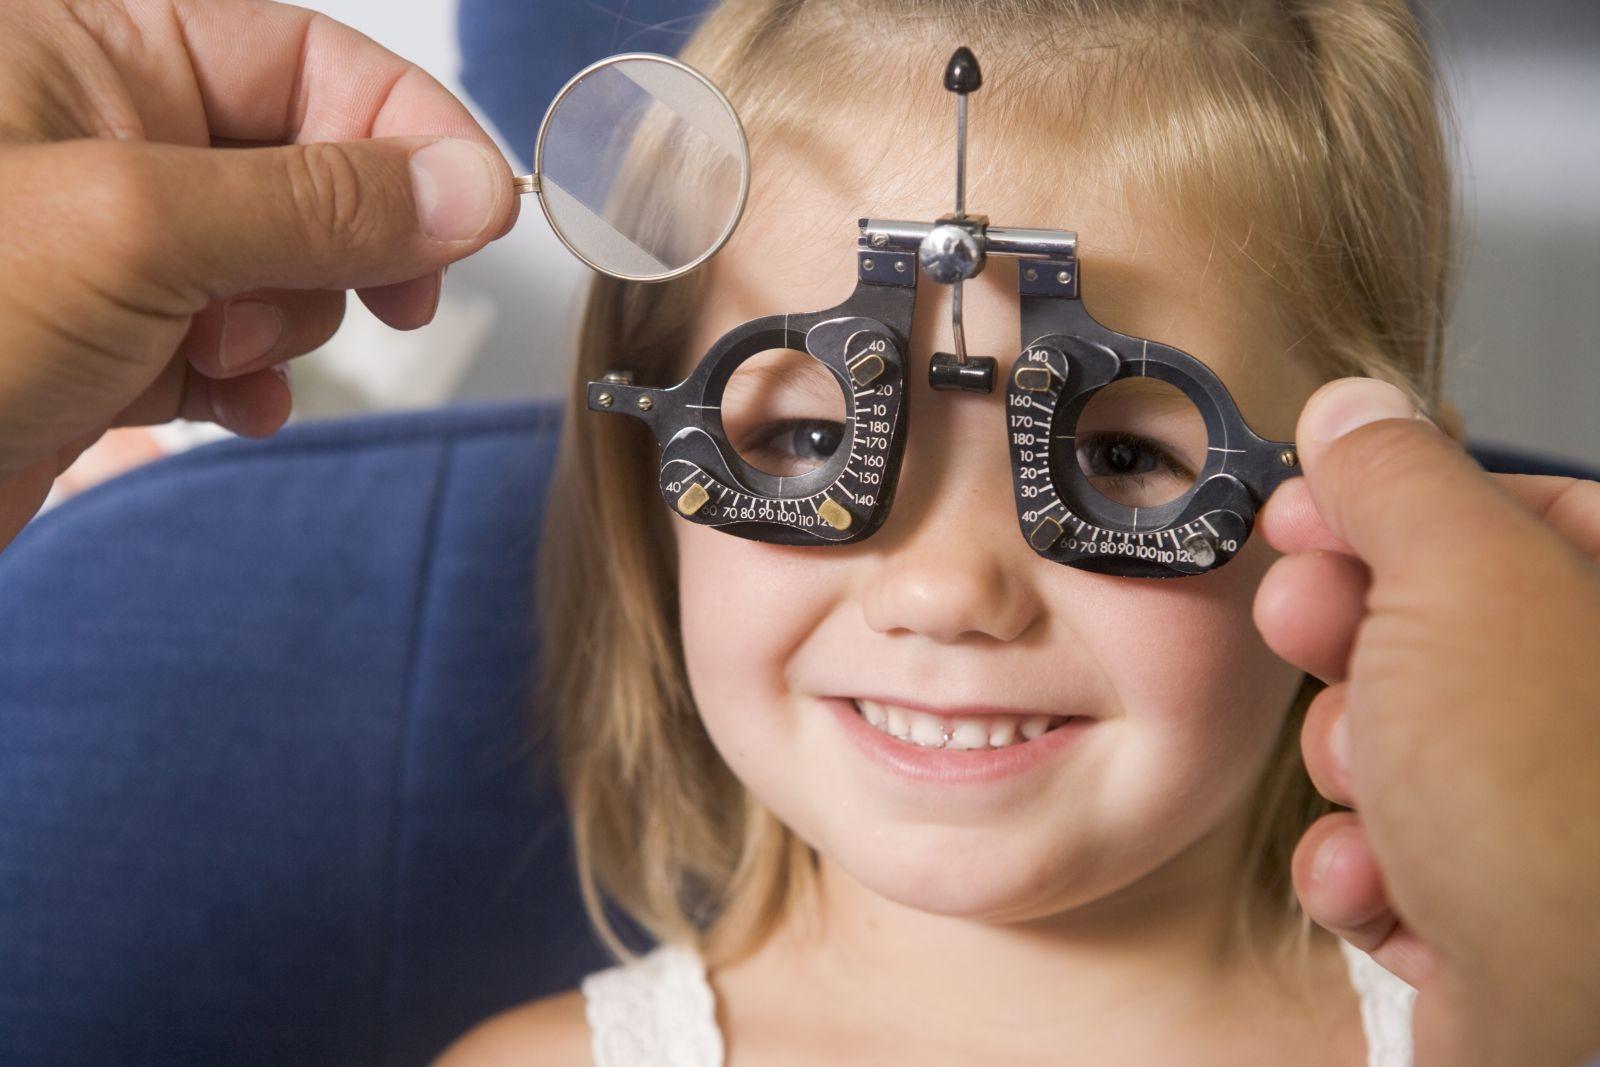 Восстановление зрения по жданову метод шичко-бейтса